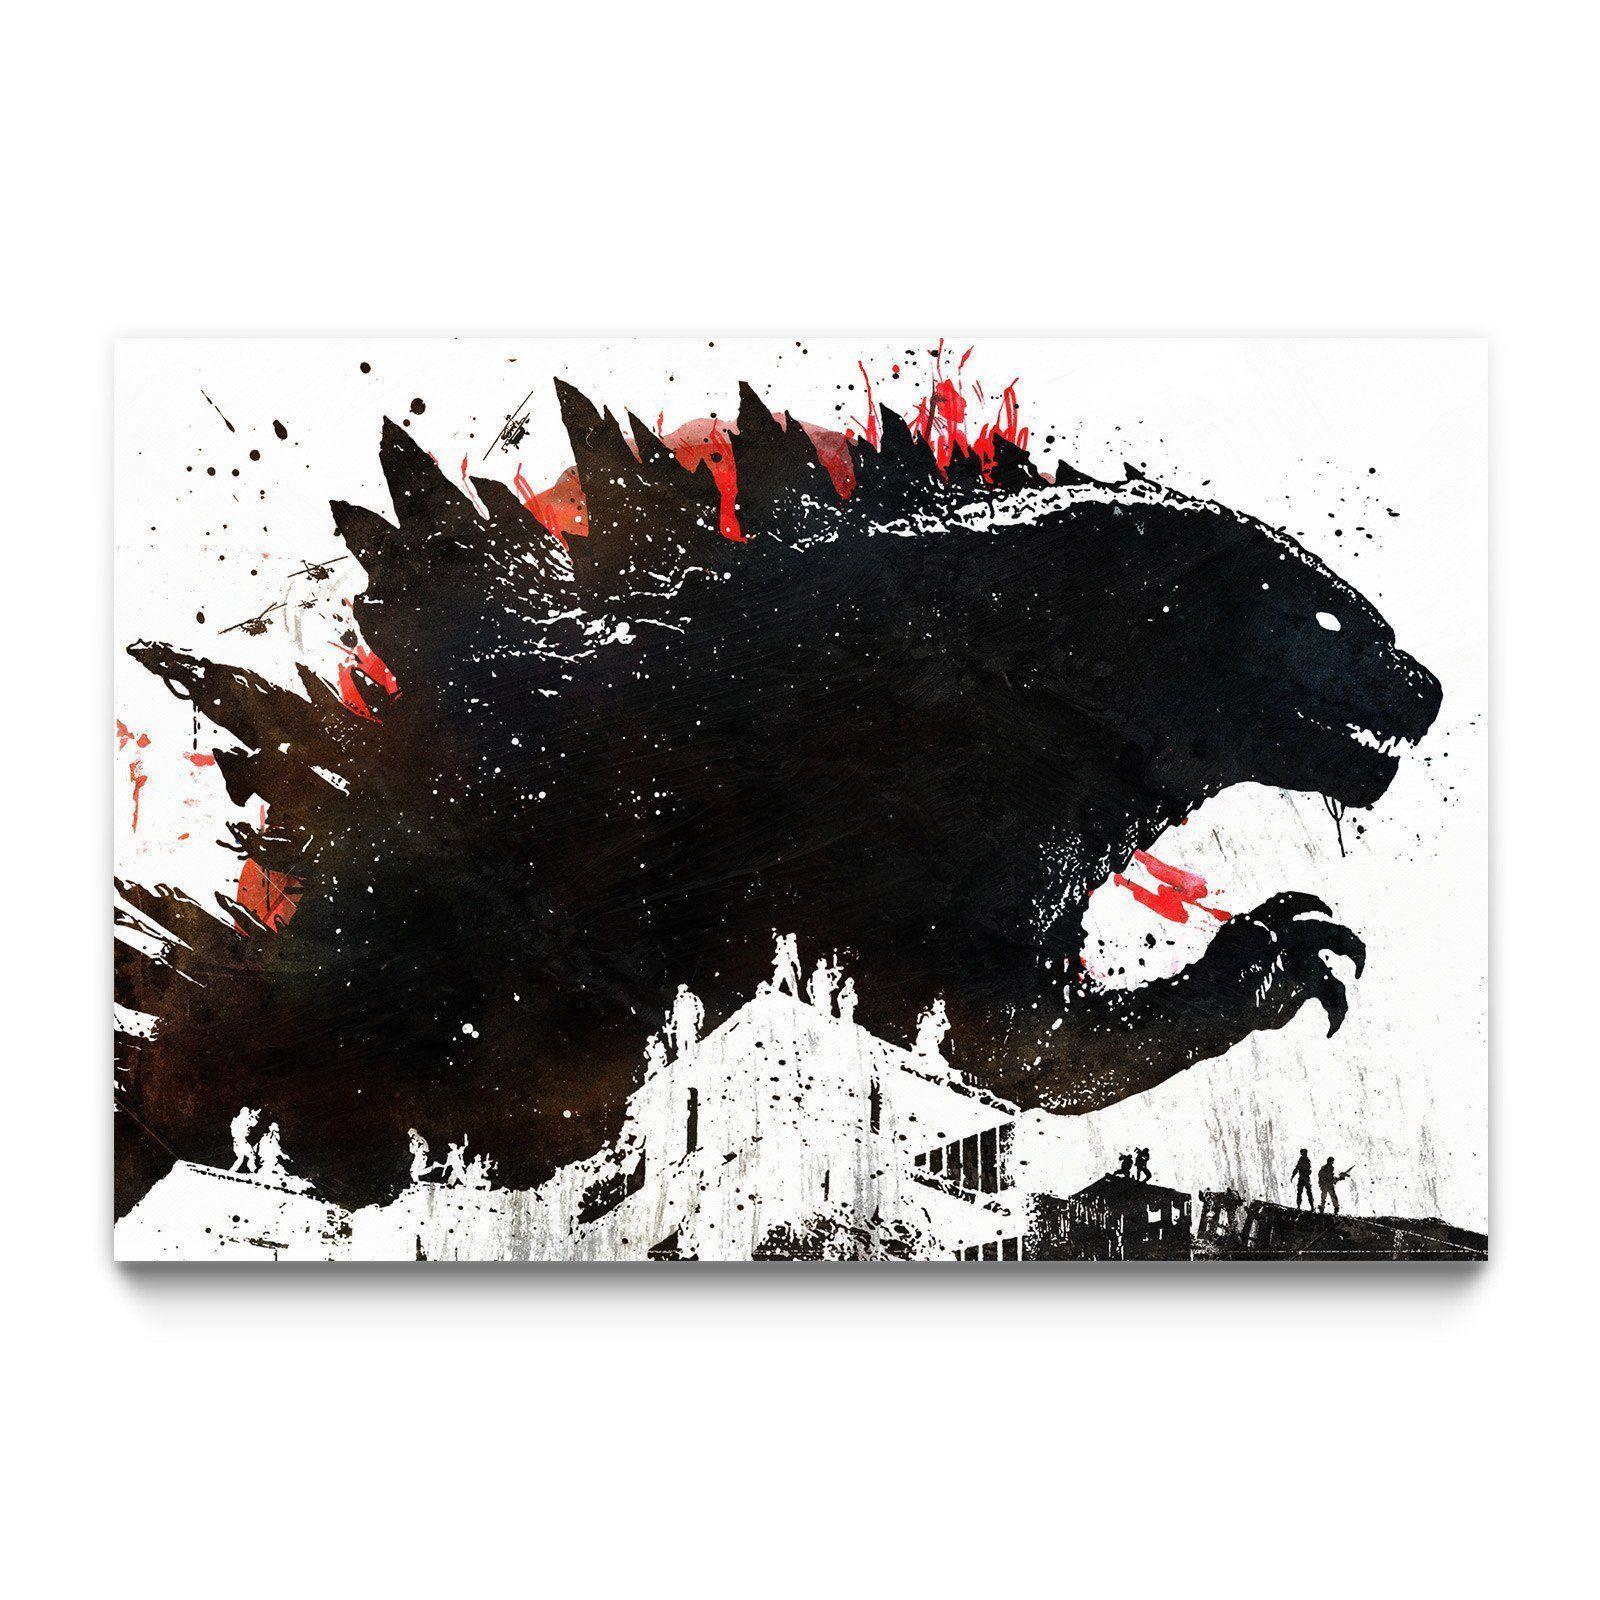 Monster Godzilla wallpaper, Godzilla tattoo, Godzilla